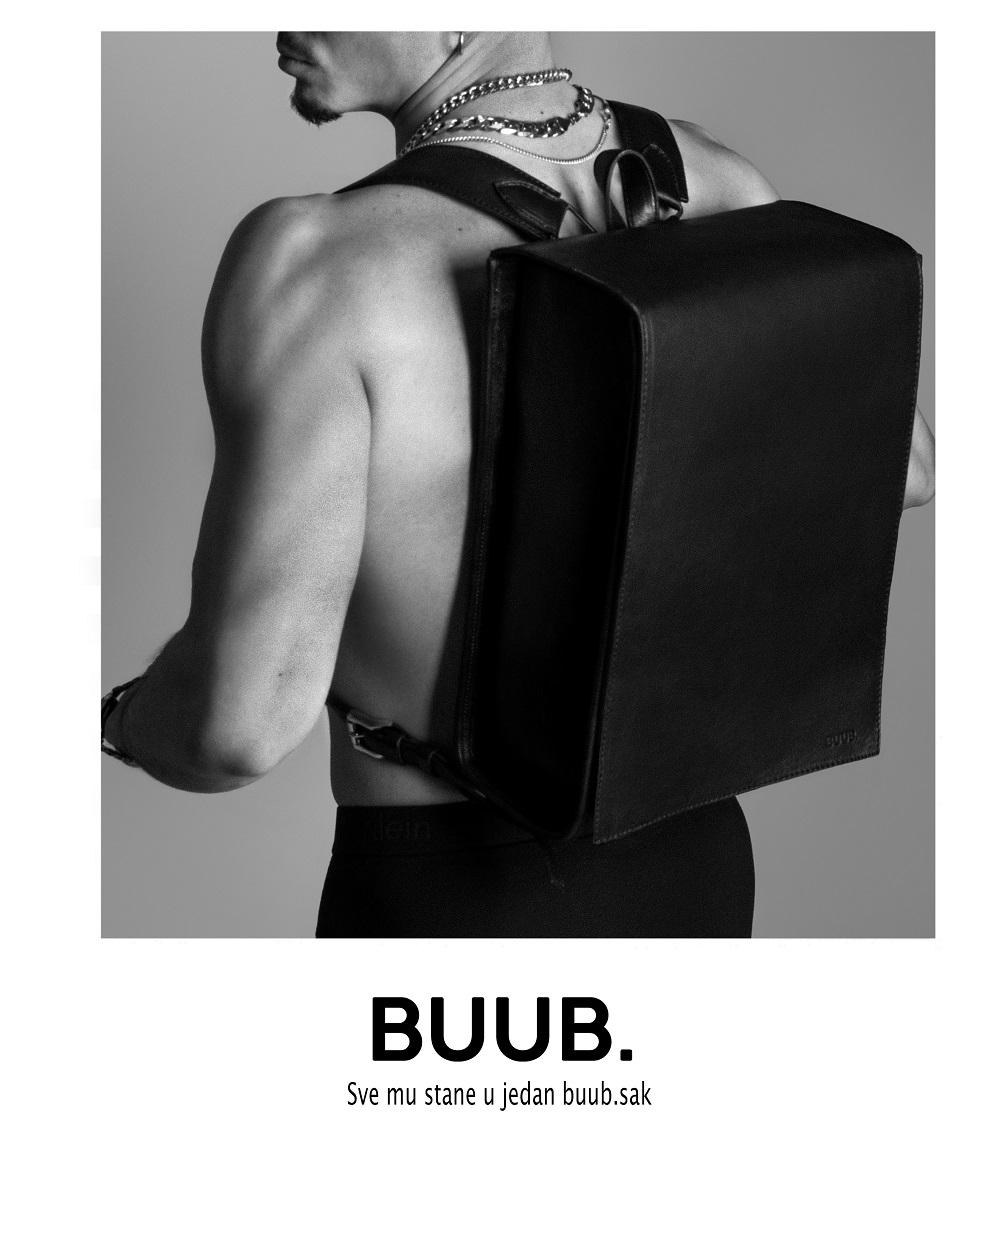 BUUB 2020 (5)